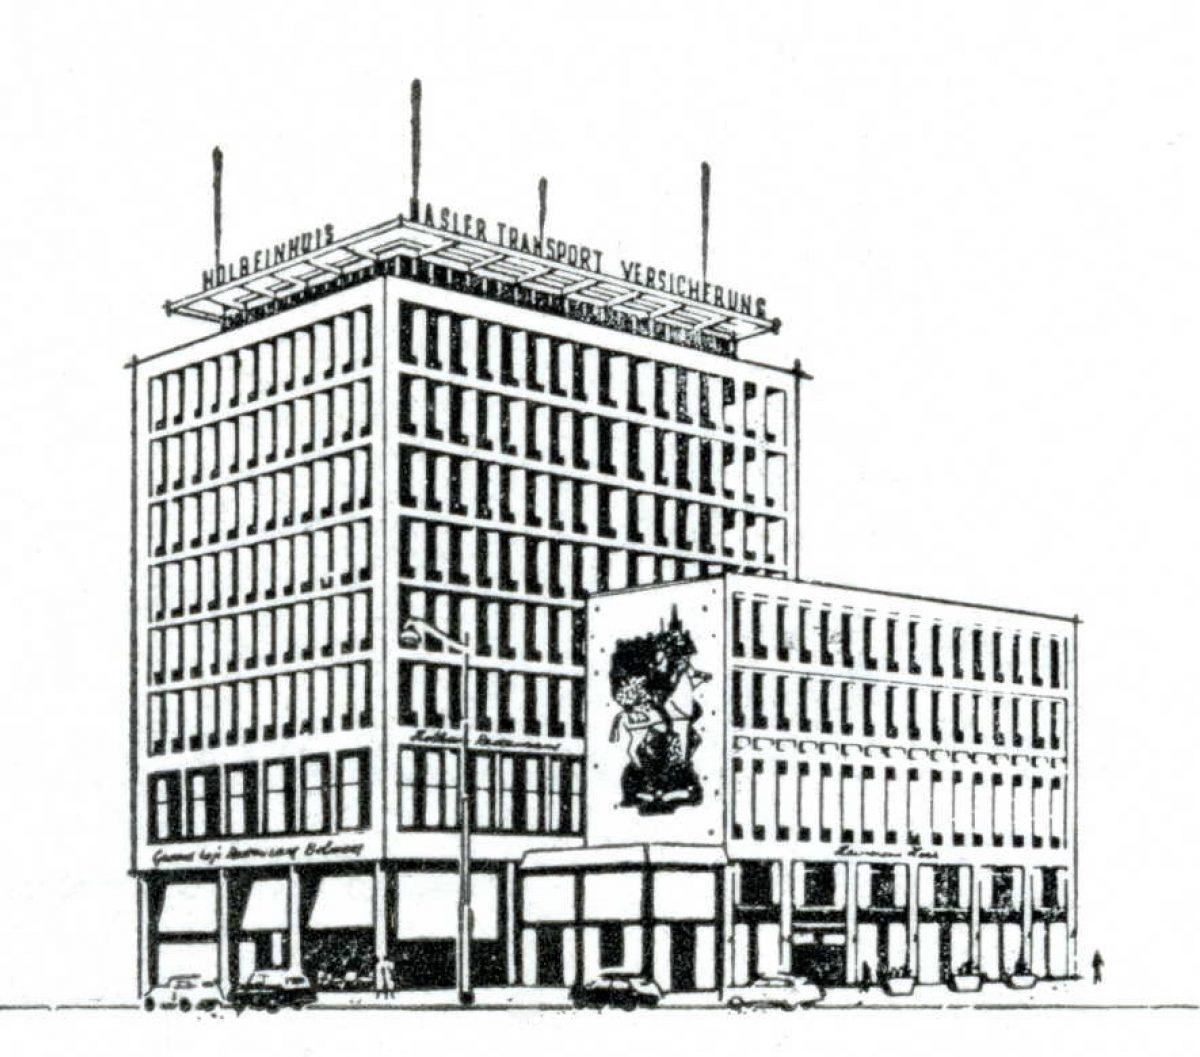 07 holbeinhuis 1958 Maasstad 1958 1 2 3 p 68 2